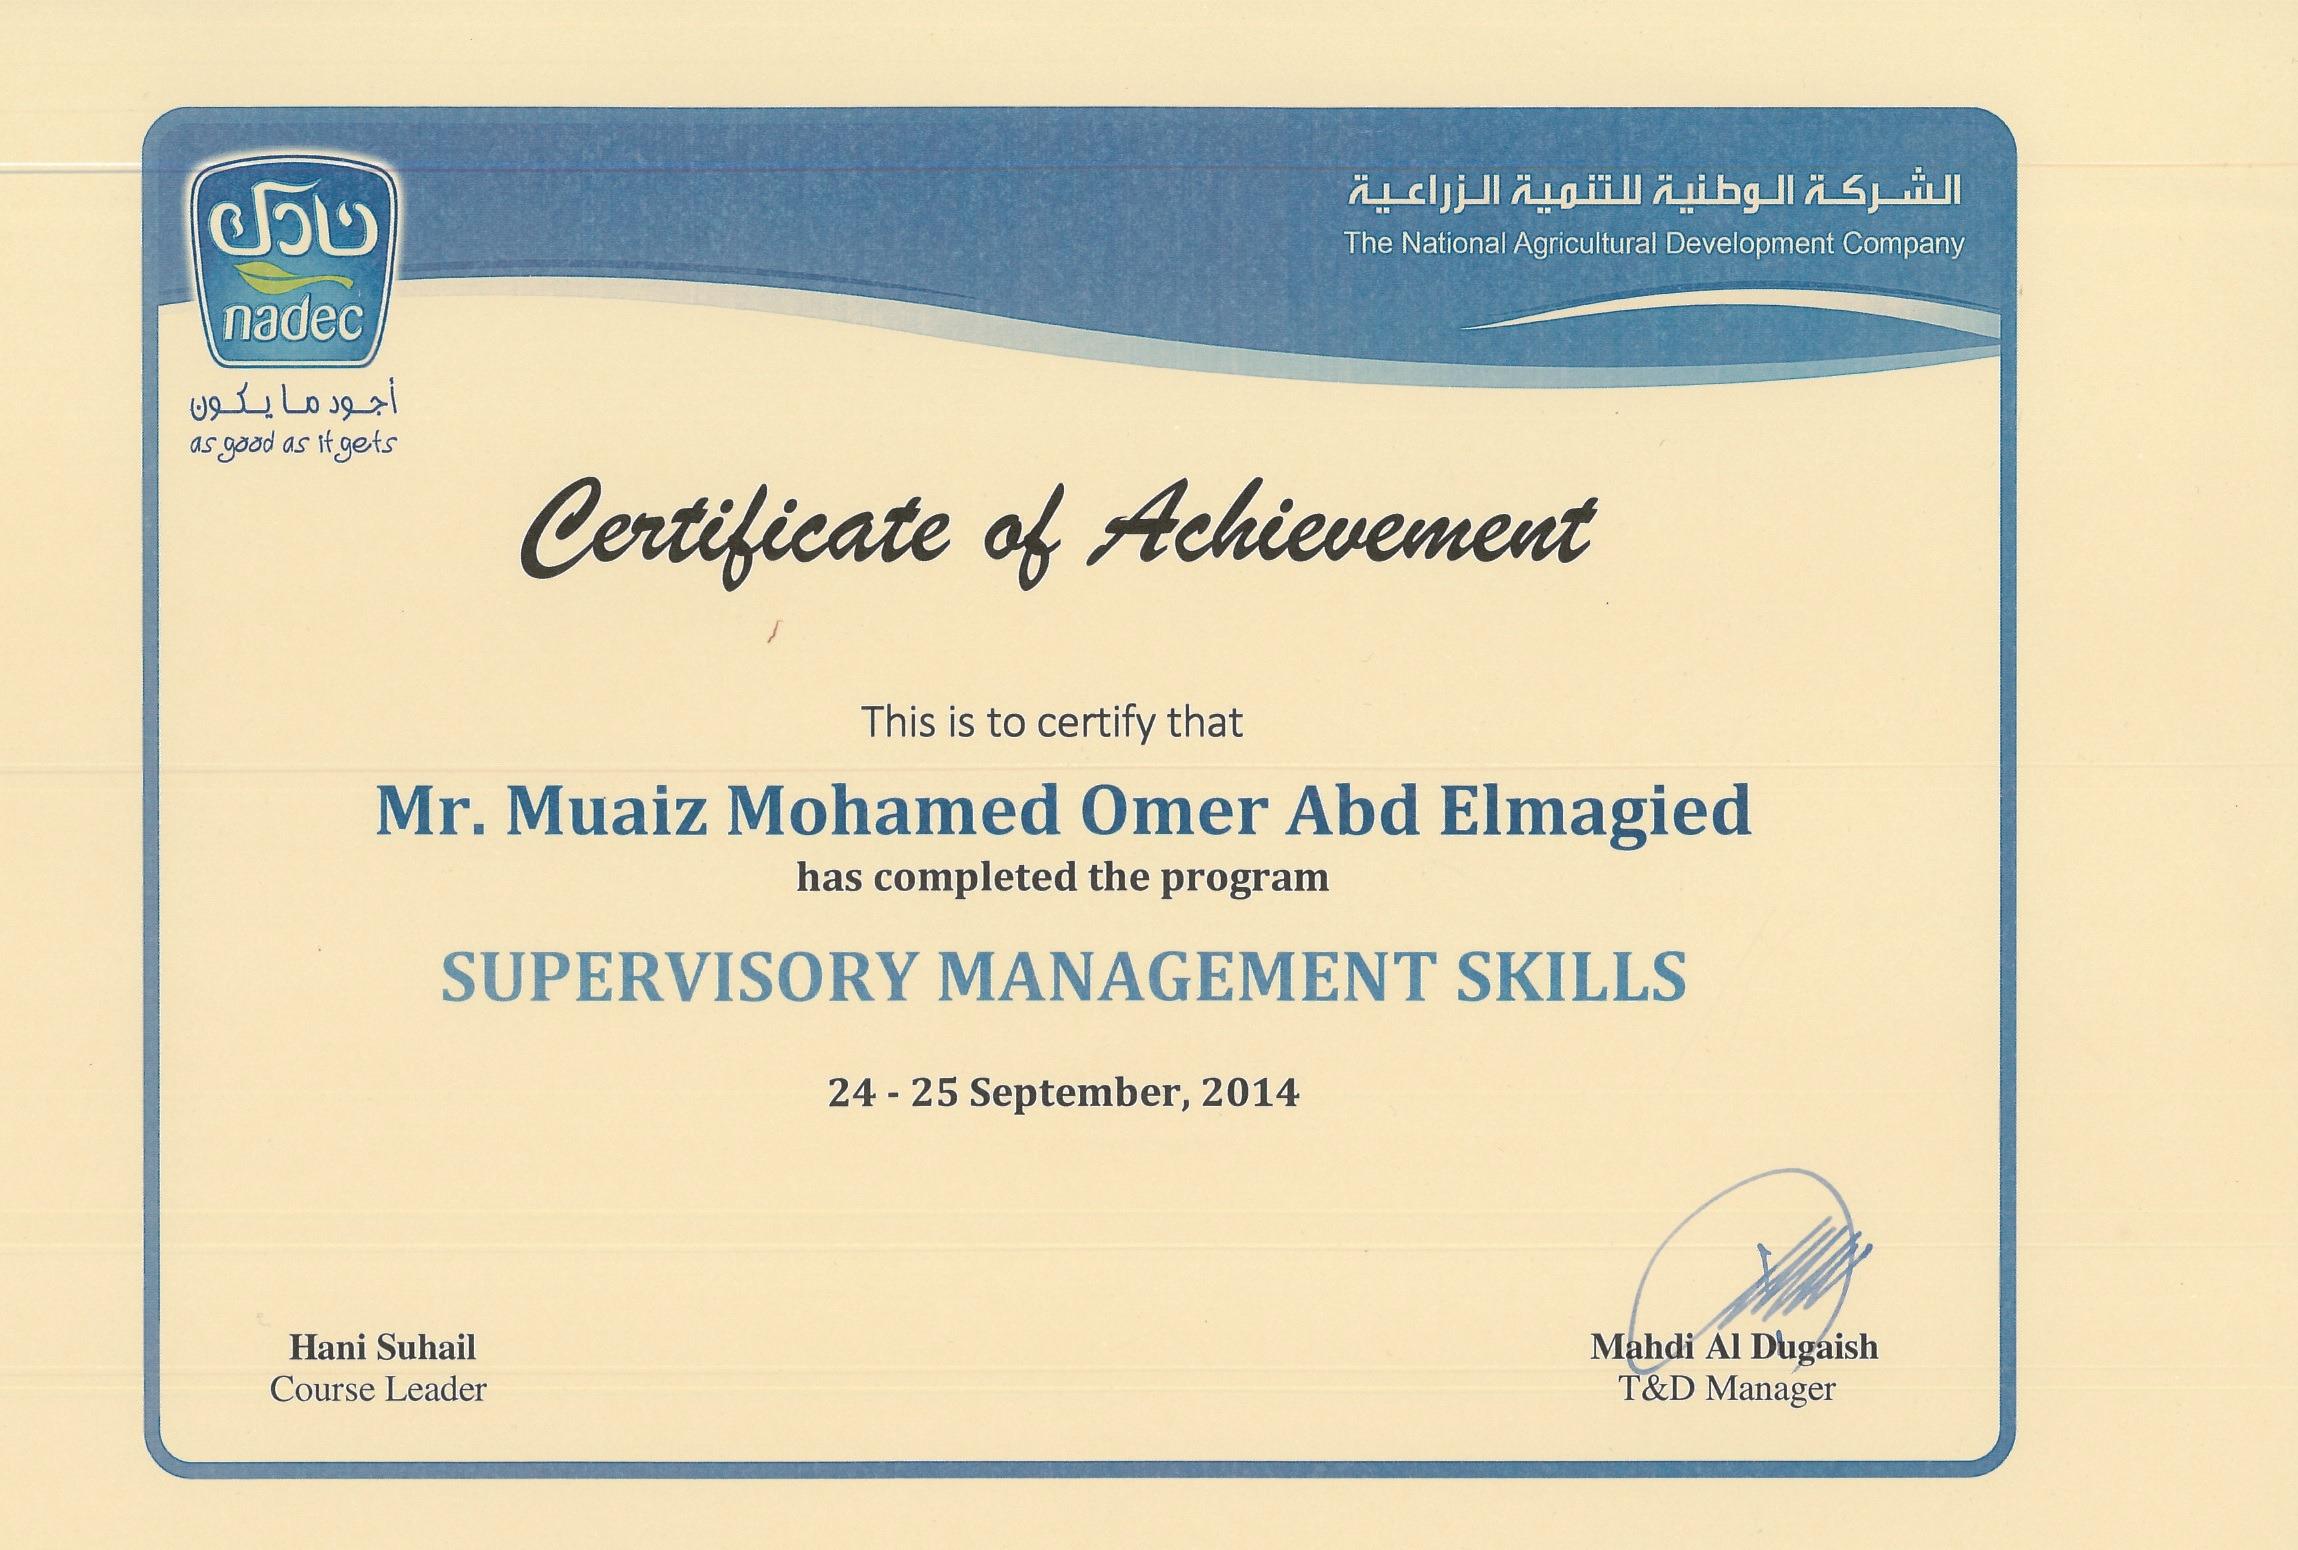 Supervisory management skills